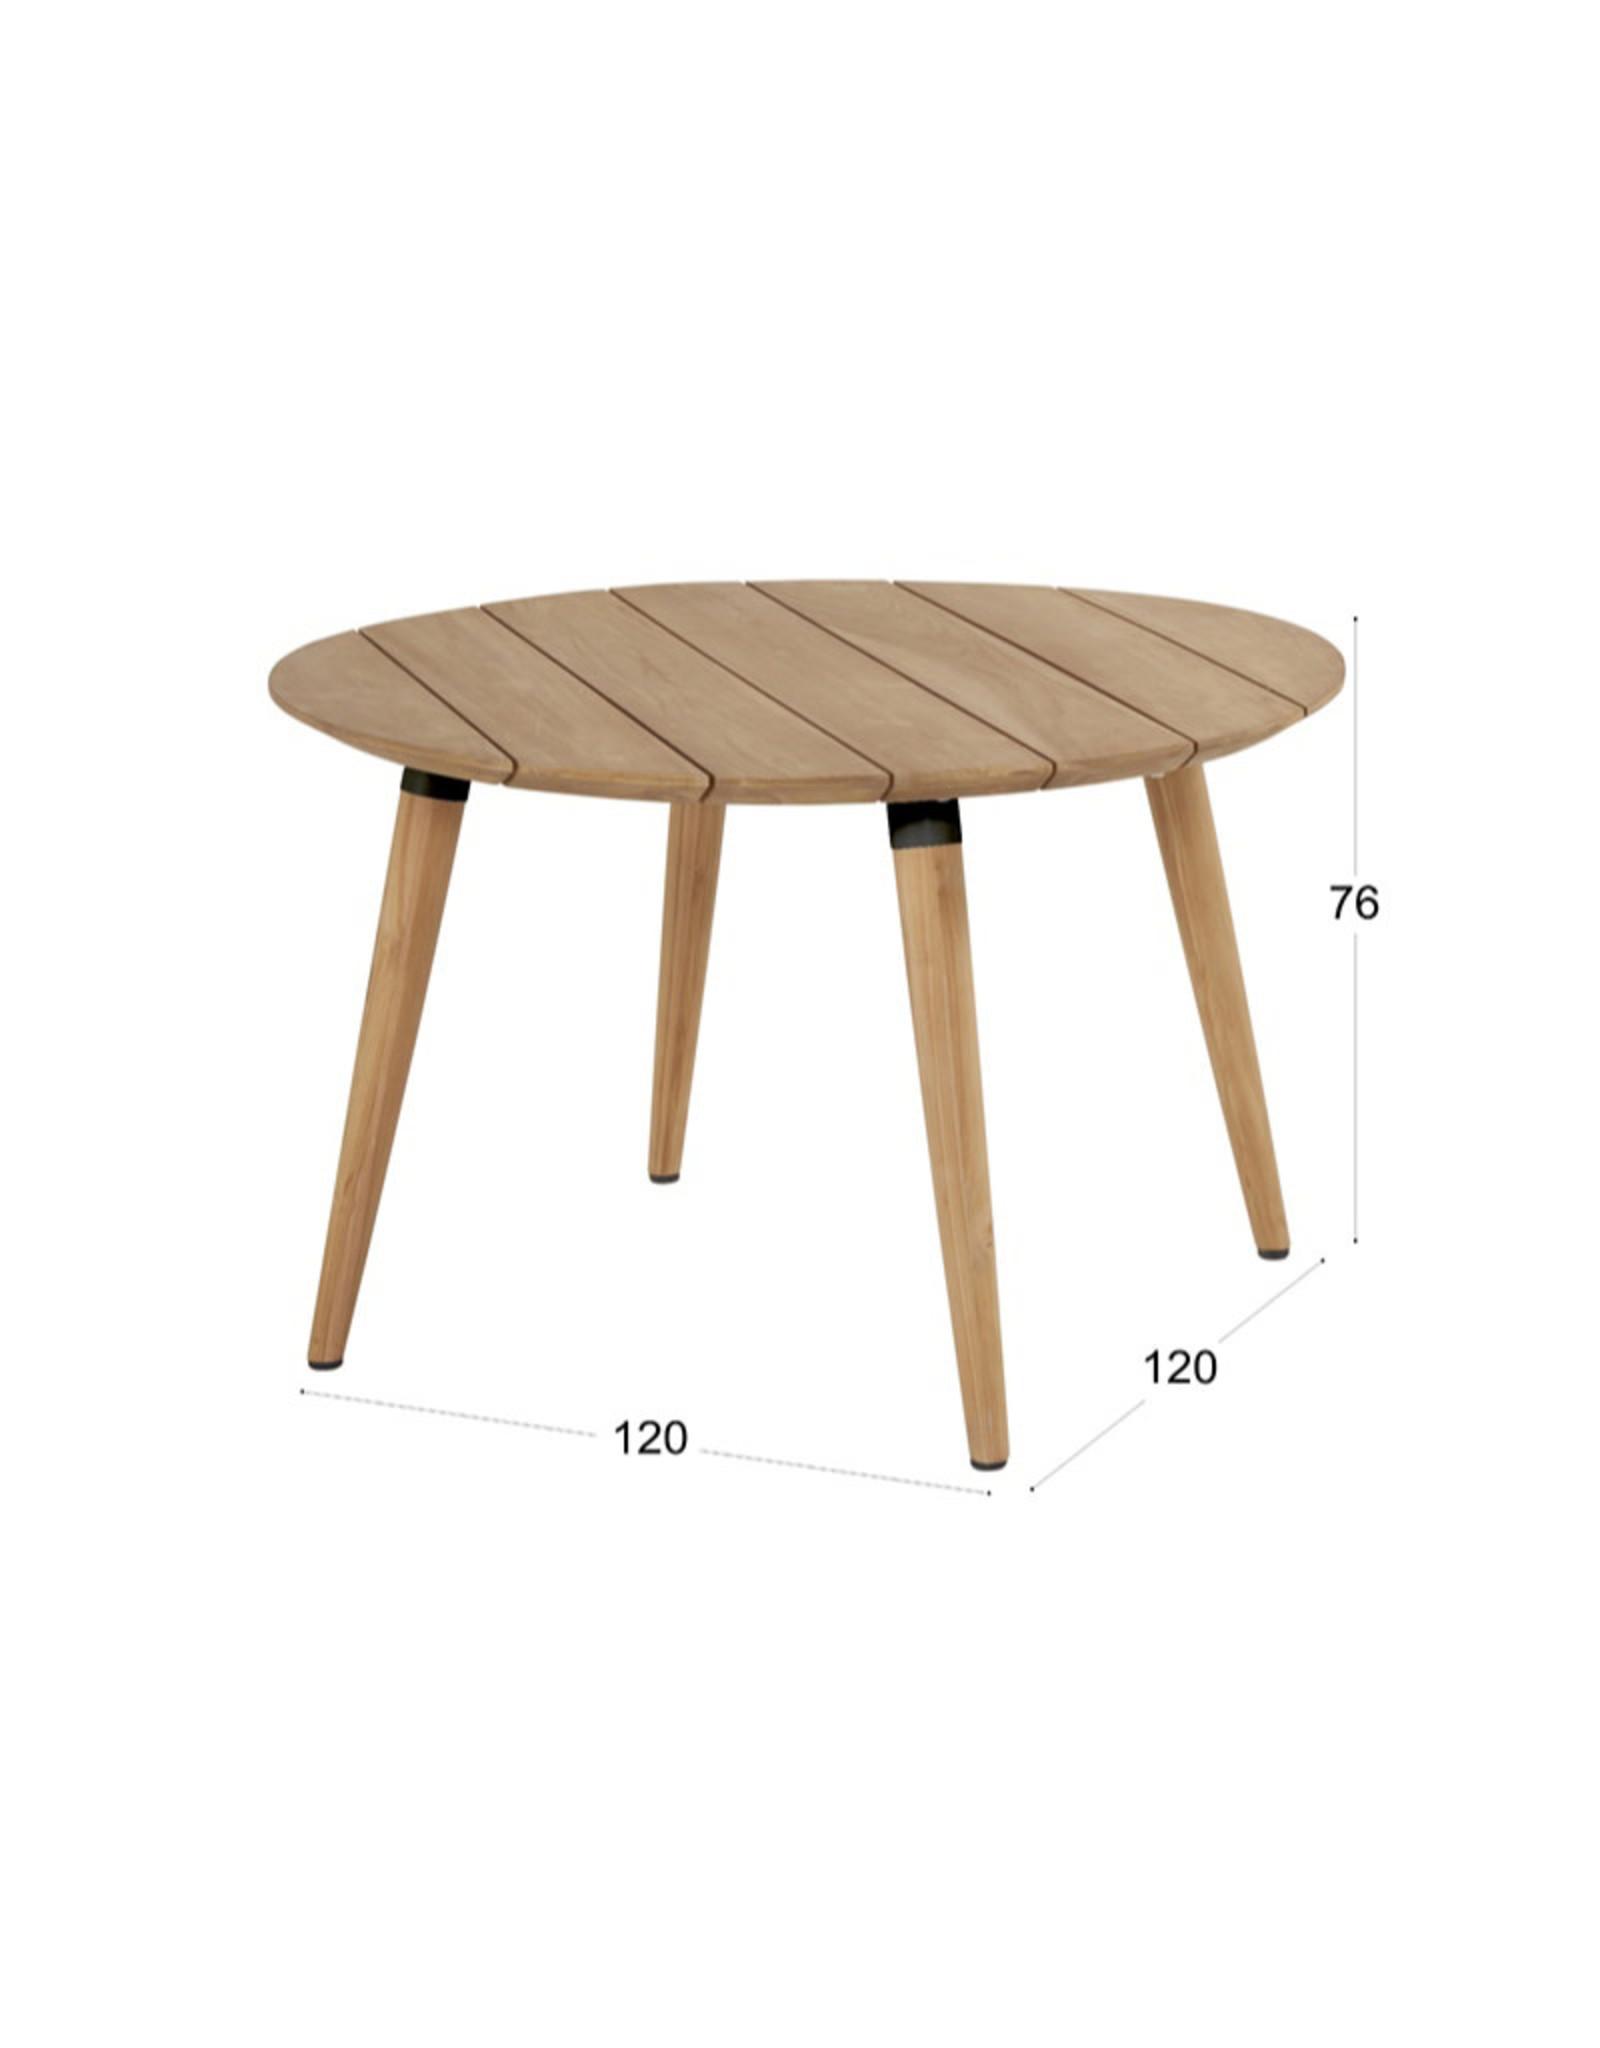 Hartman Hartman Sophie Teak Table r.120cm (set article)